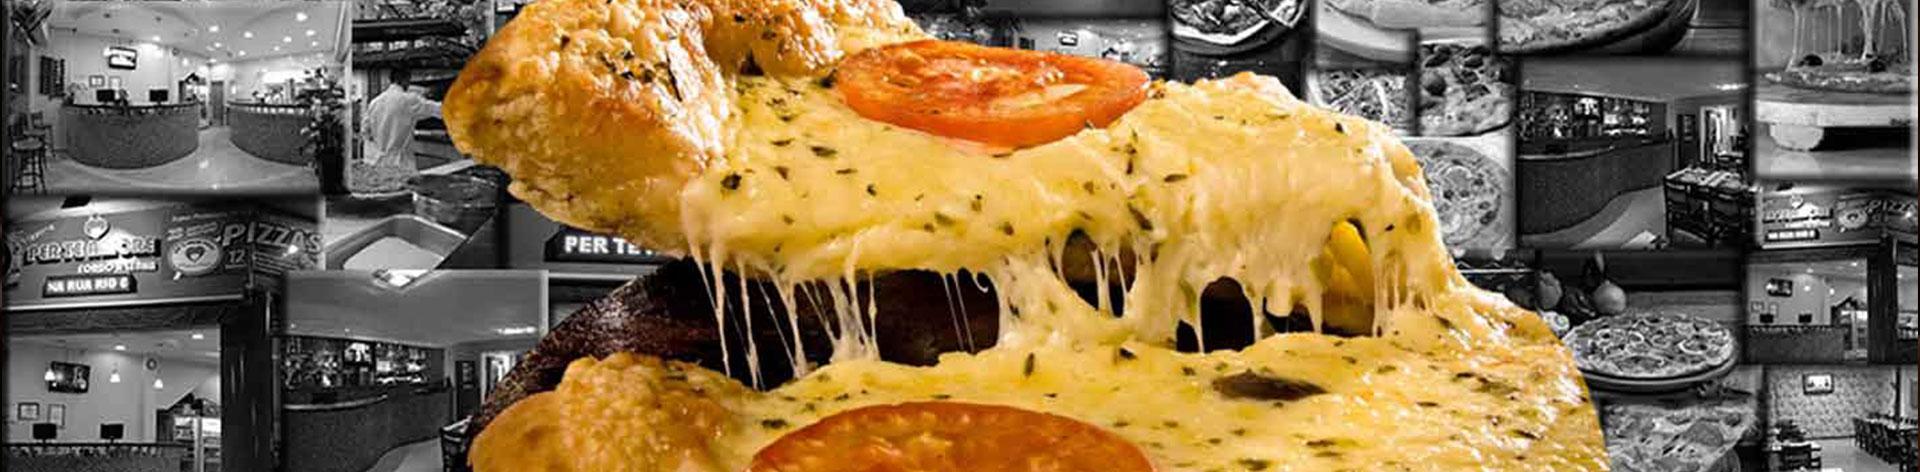 banner-principal-pizzaria-sao-paulo